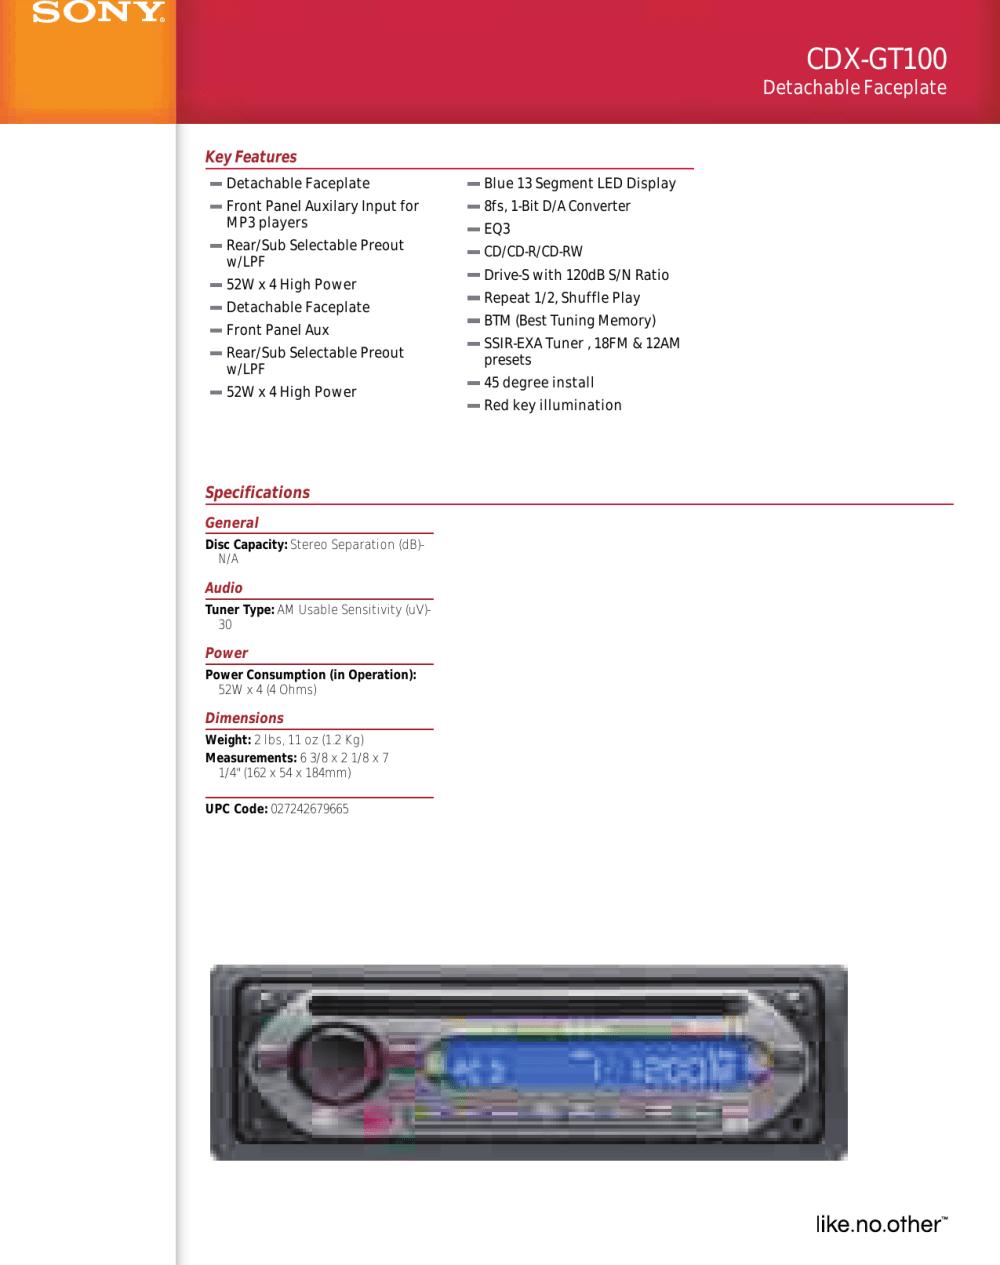 medium resolution of sony cdx gt100 wiring diagram wiring diagrams konsult wire diagram cdx gt100